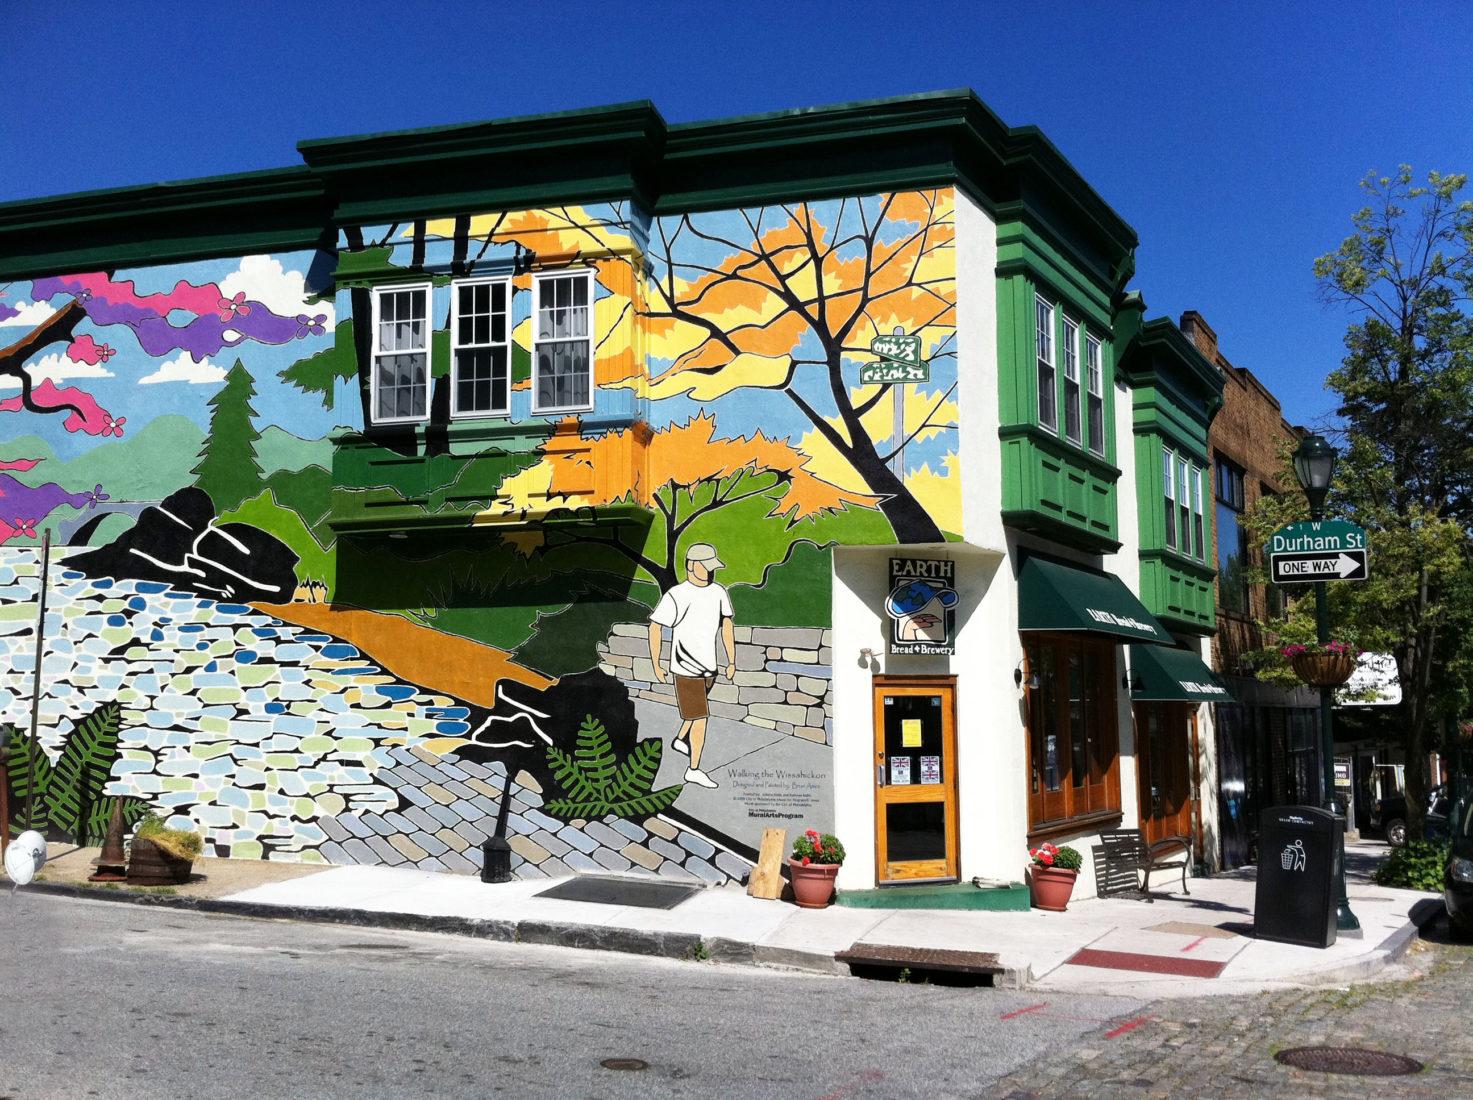 Earth Bread & Brewery, Germantown PA